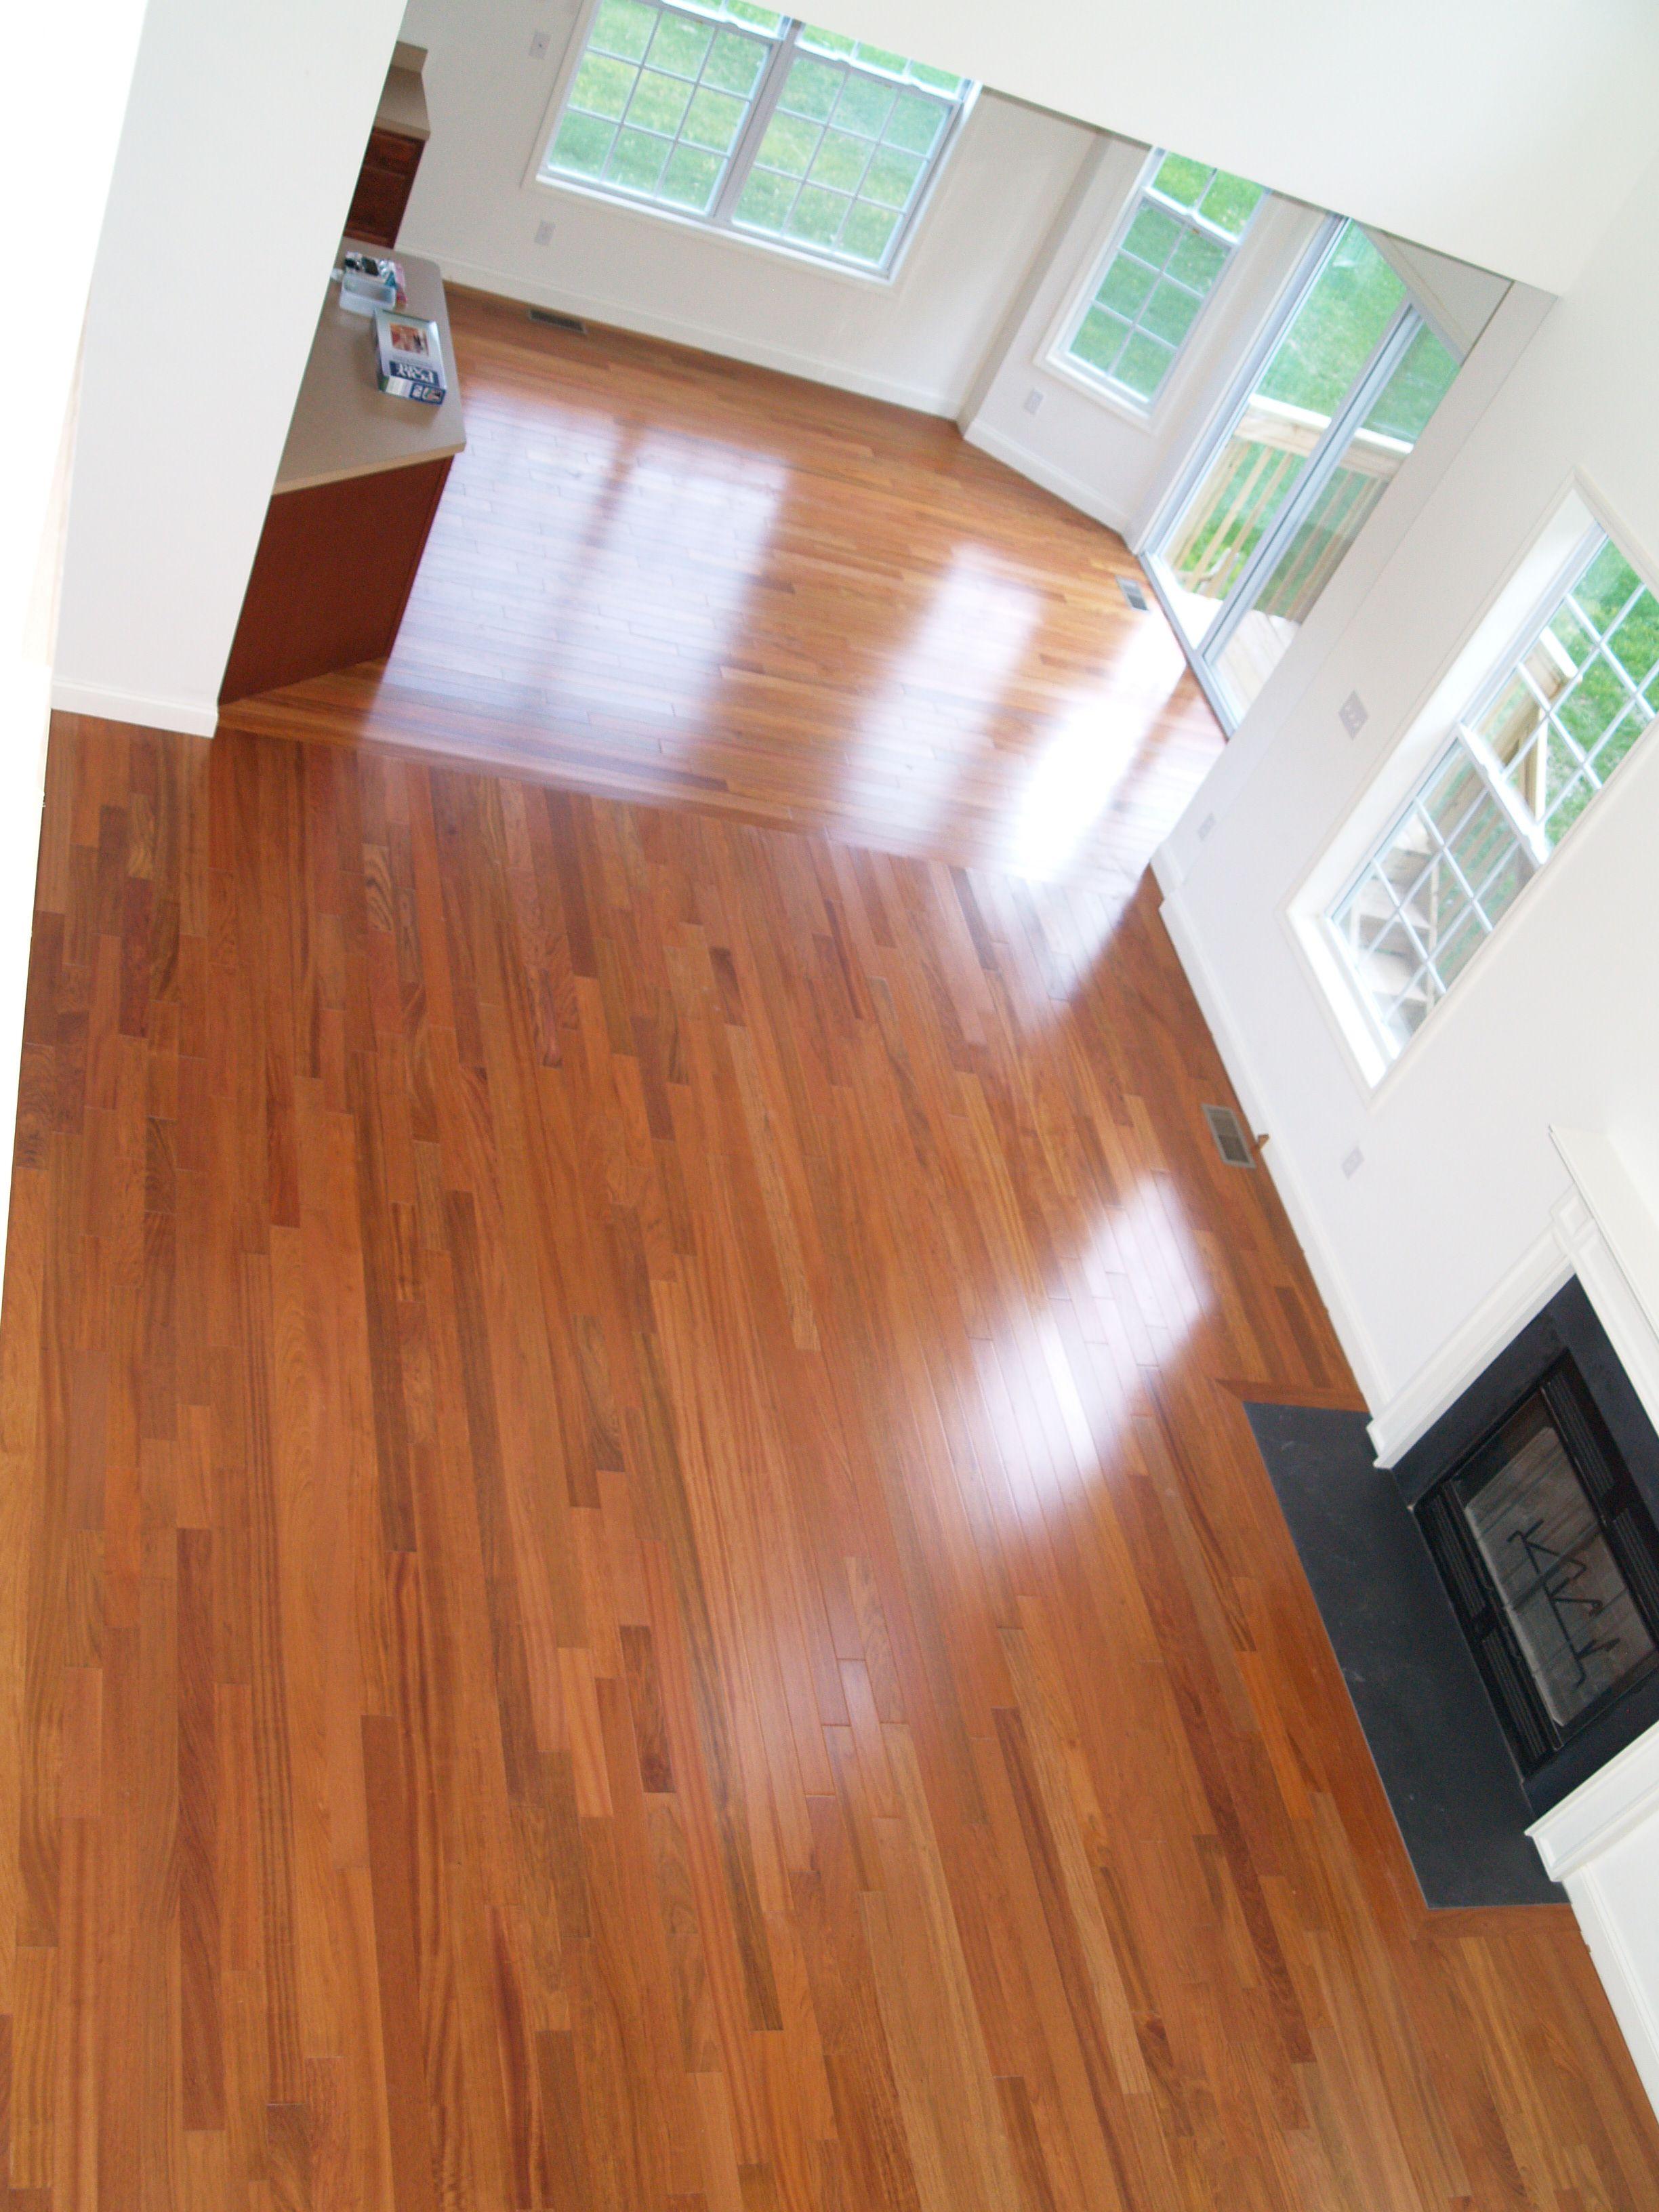 Solid Brazilian Cherry Jatoba Hardwood Flooring New